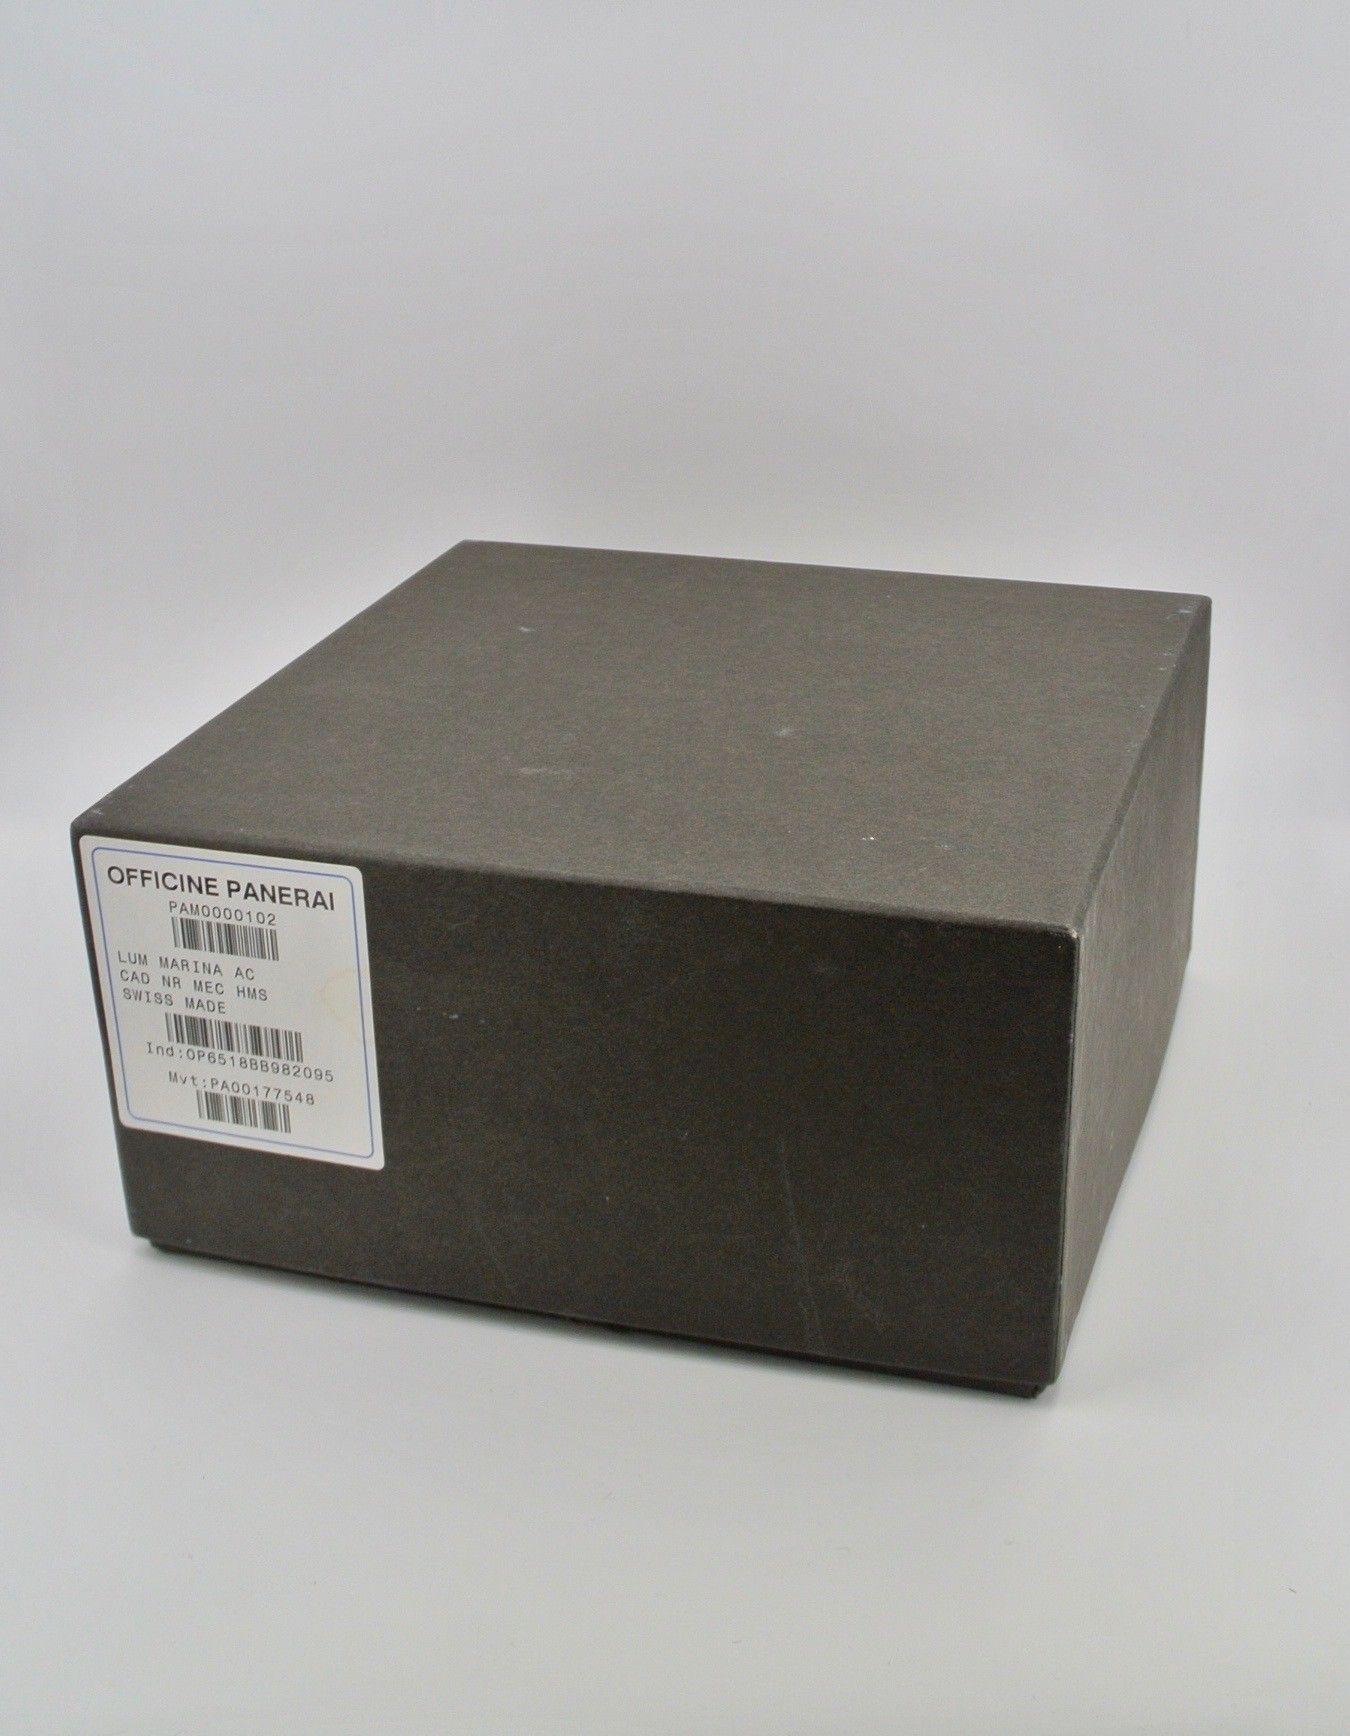 Panerai OP 6518 TRIZIUM DIAL